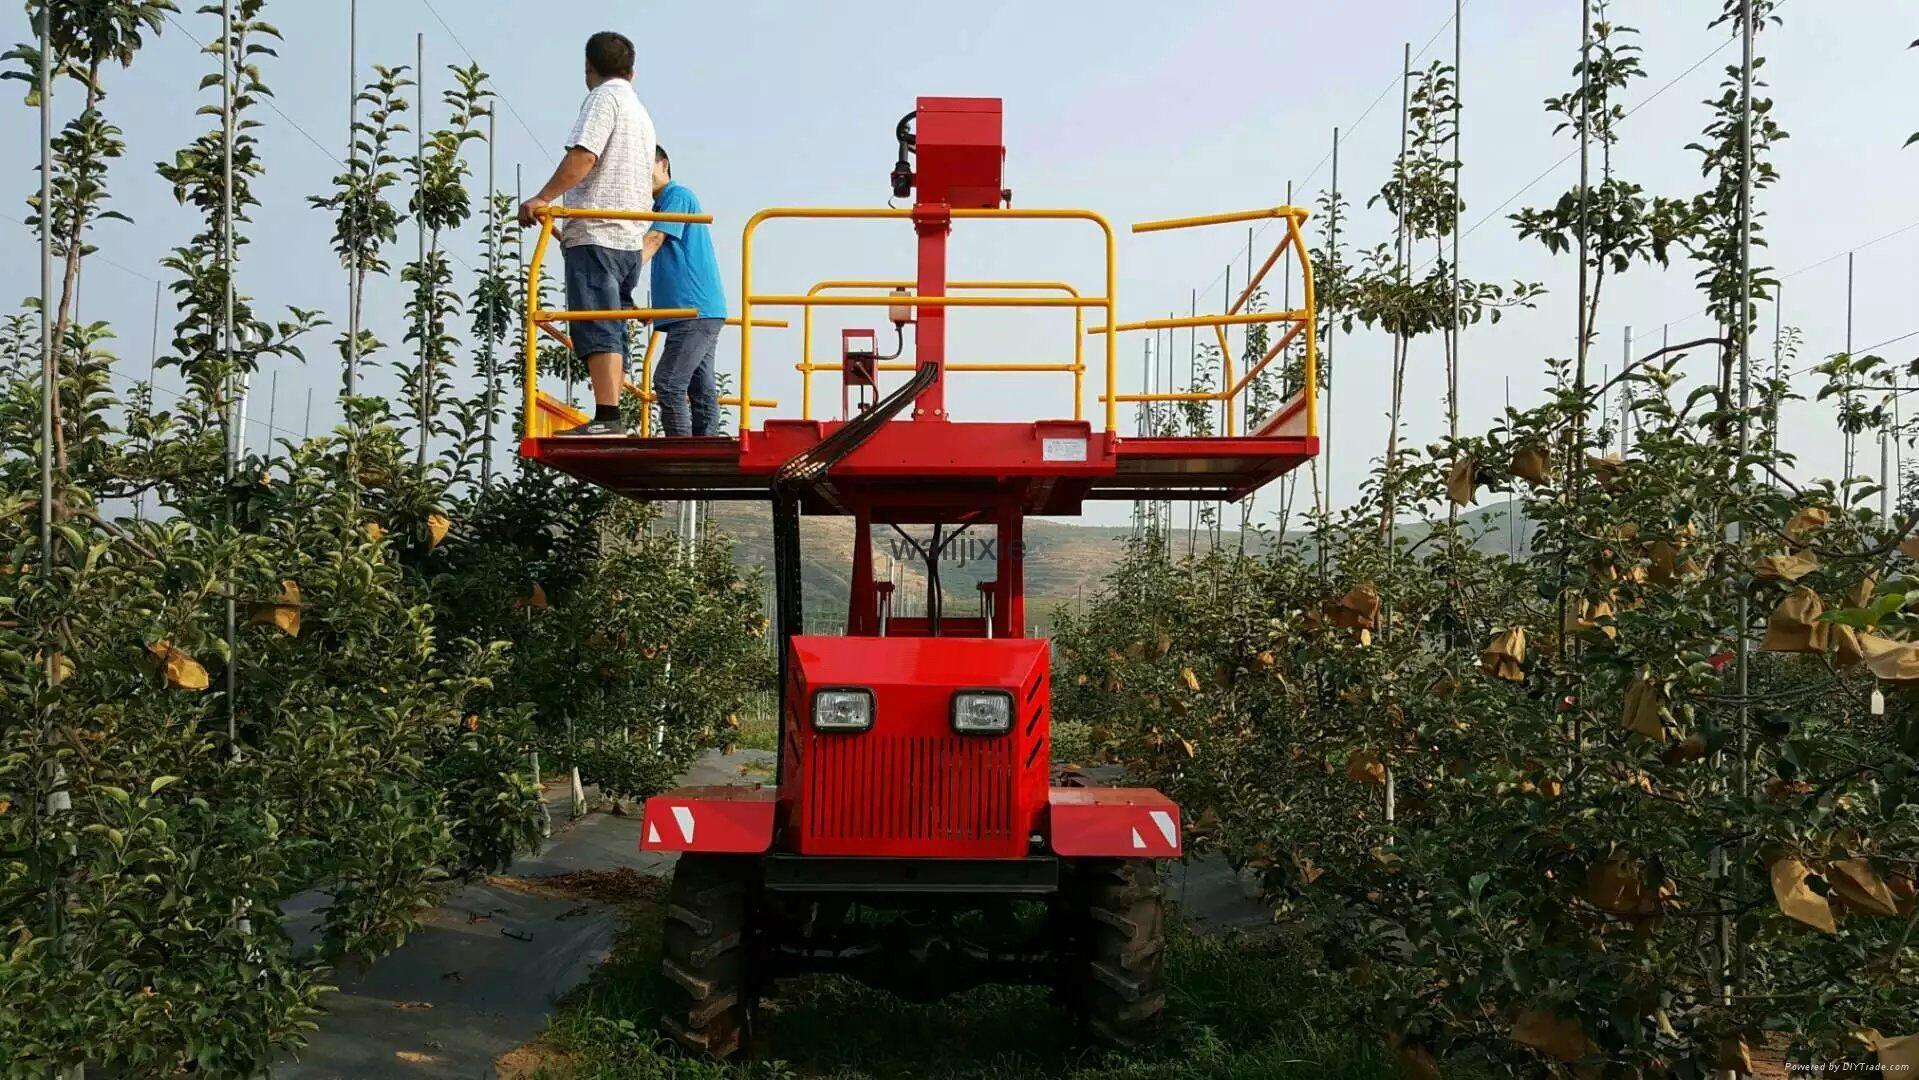 Wheel type self popelled type garden work platform